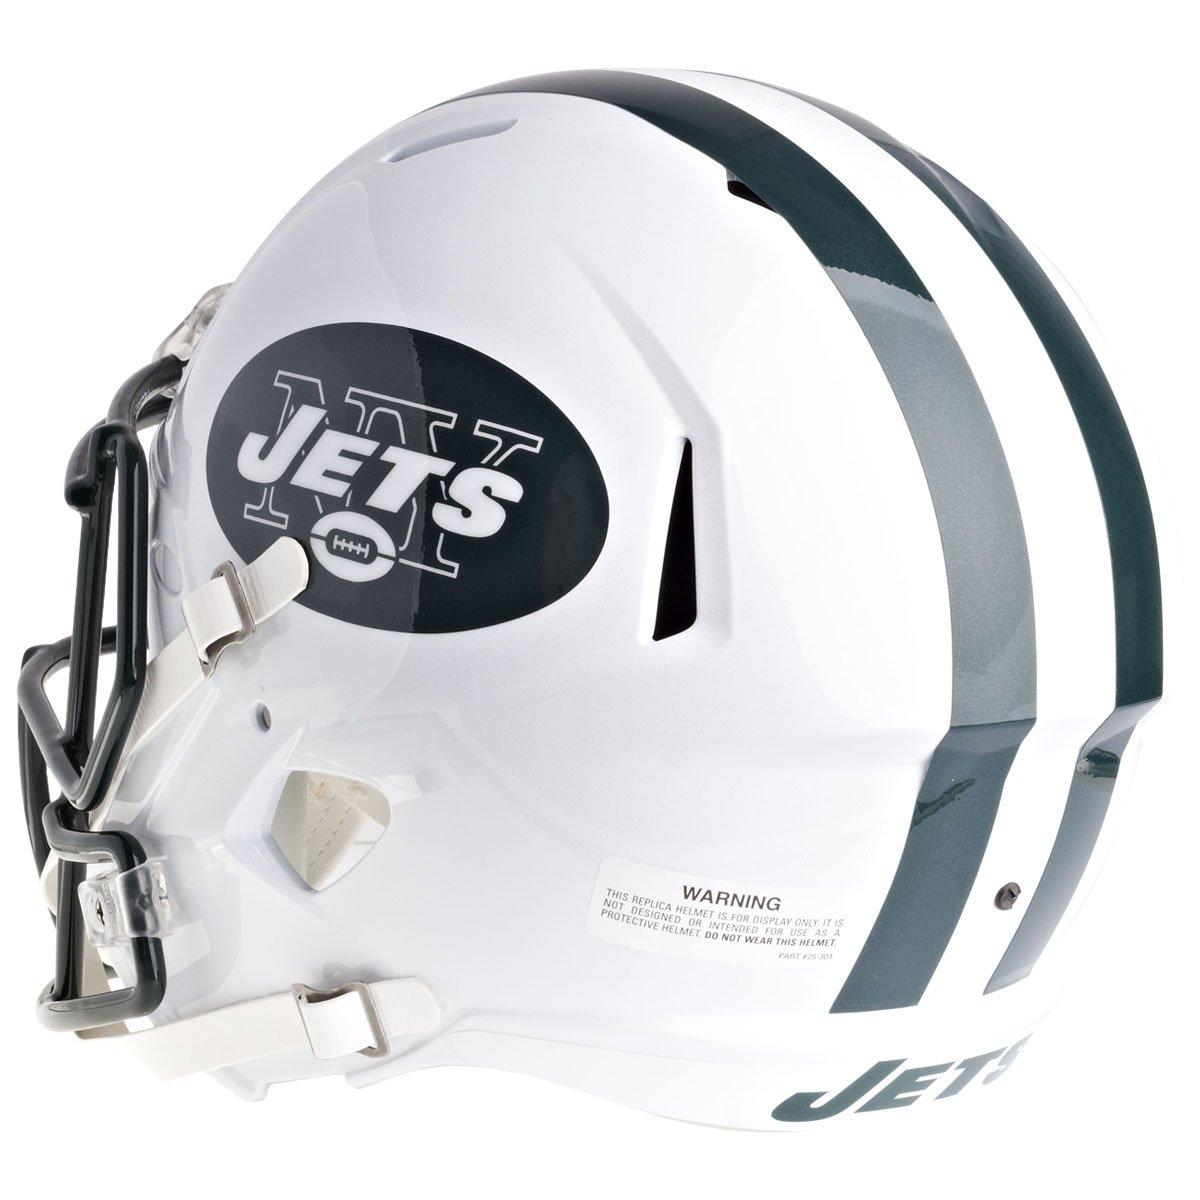 550 Size New York Jets Replica Helmet on base New NFL Football Poly Helmet